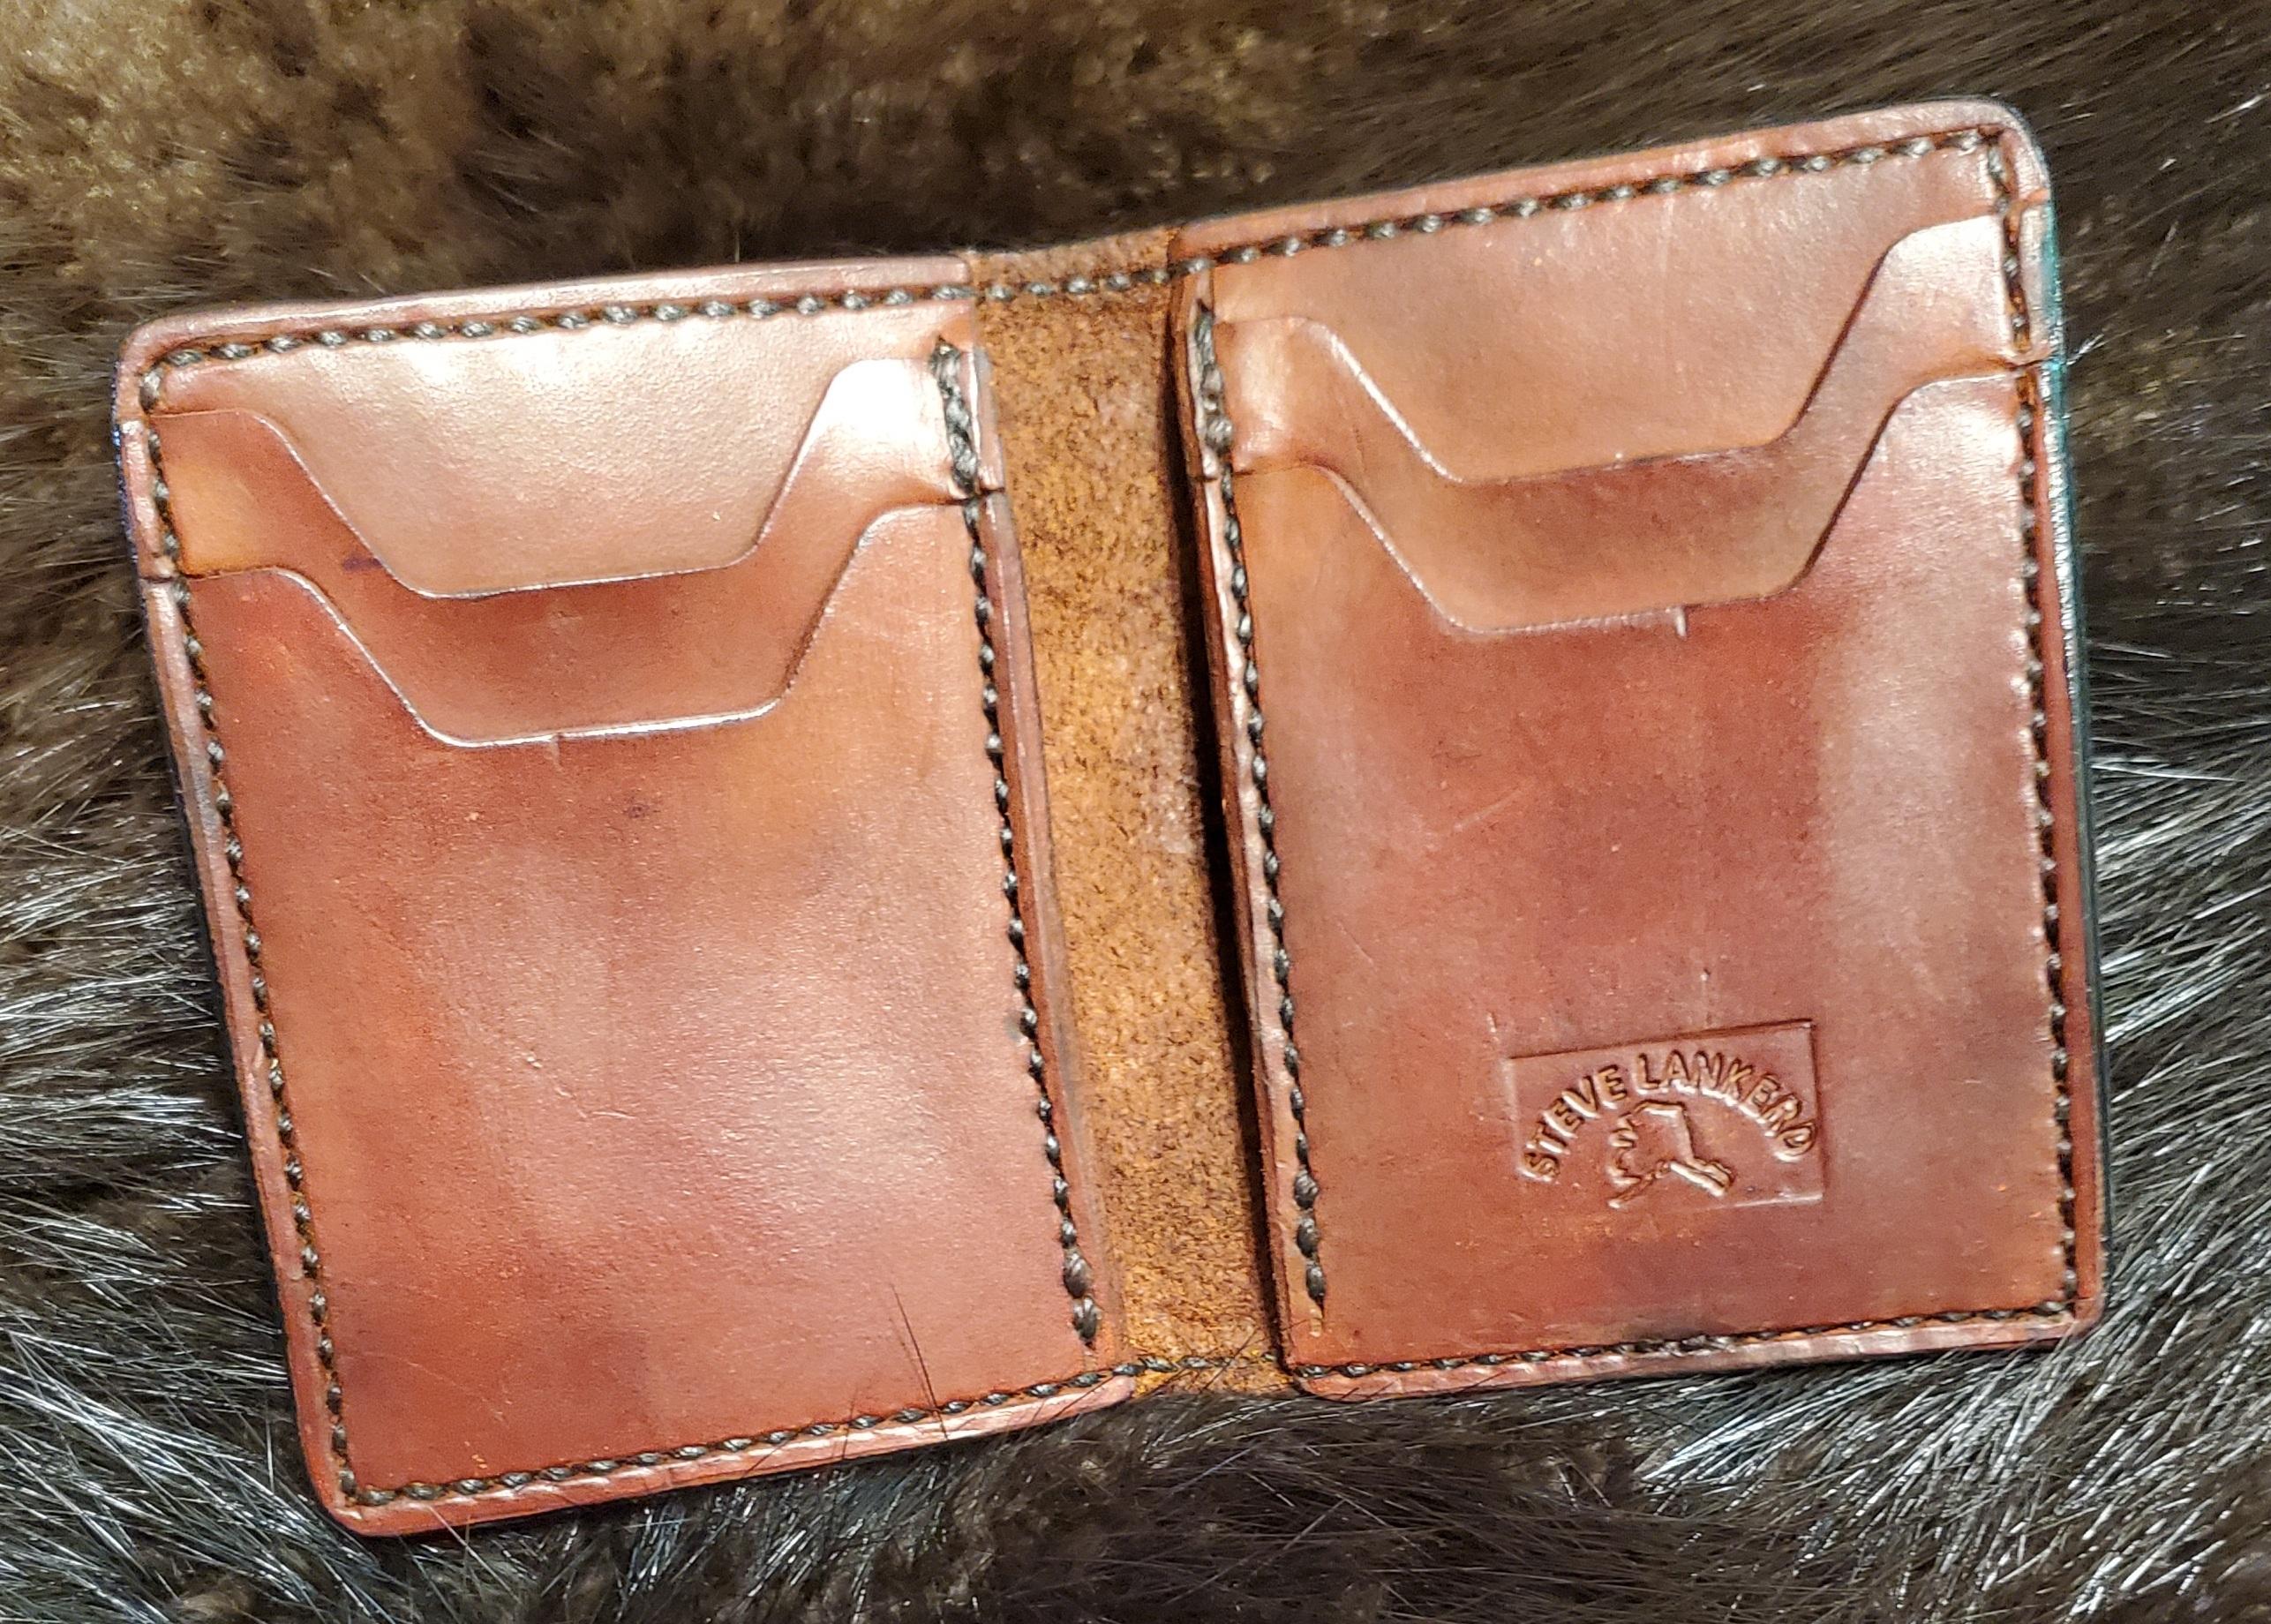 (Inside) 4 pocket Minimalist Wallet, hand stitched...   $75.00